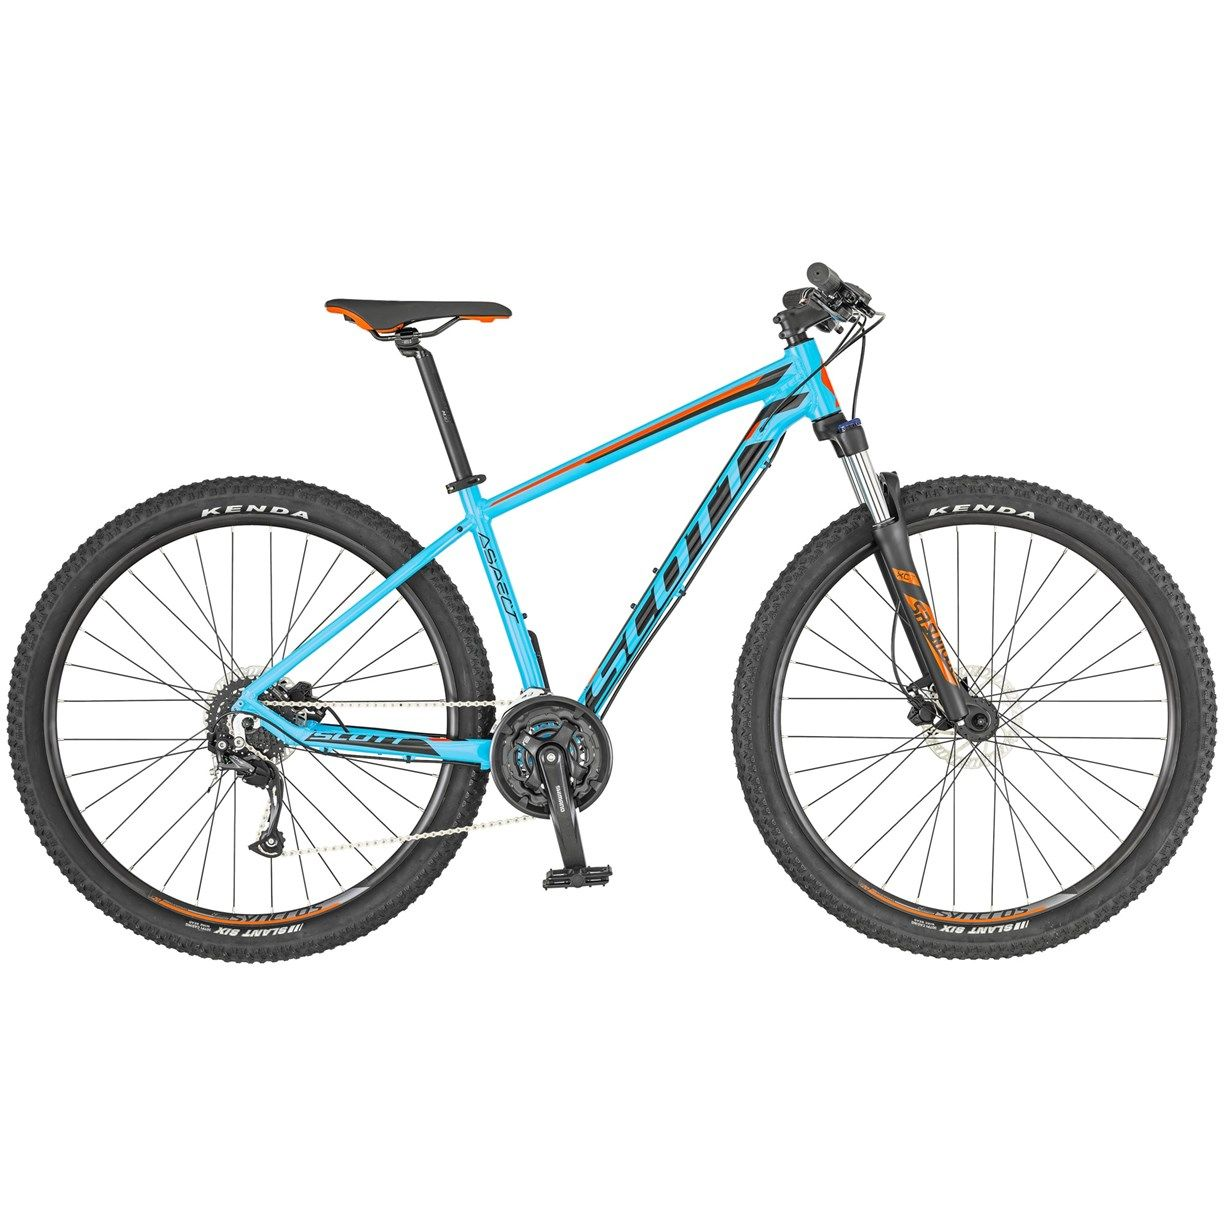 Scott Aspect 950 2019 Hardtail Mountain Bike Light Blue Red With